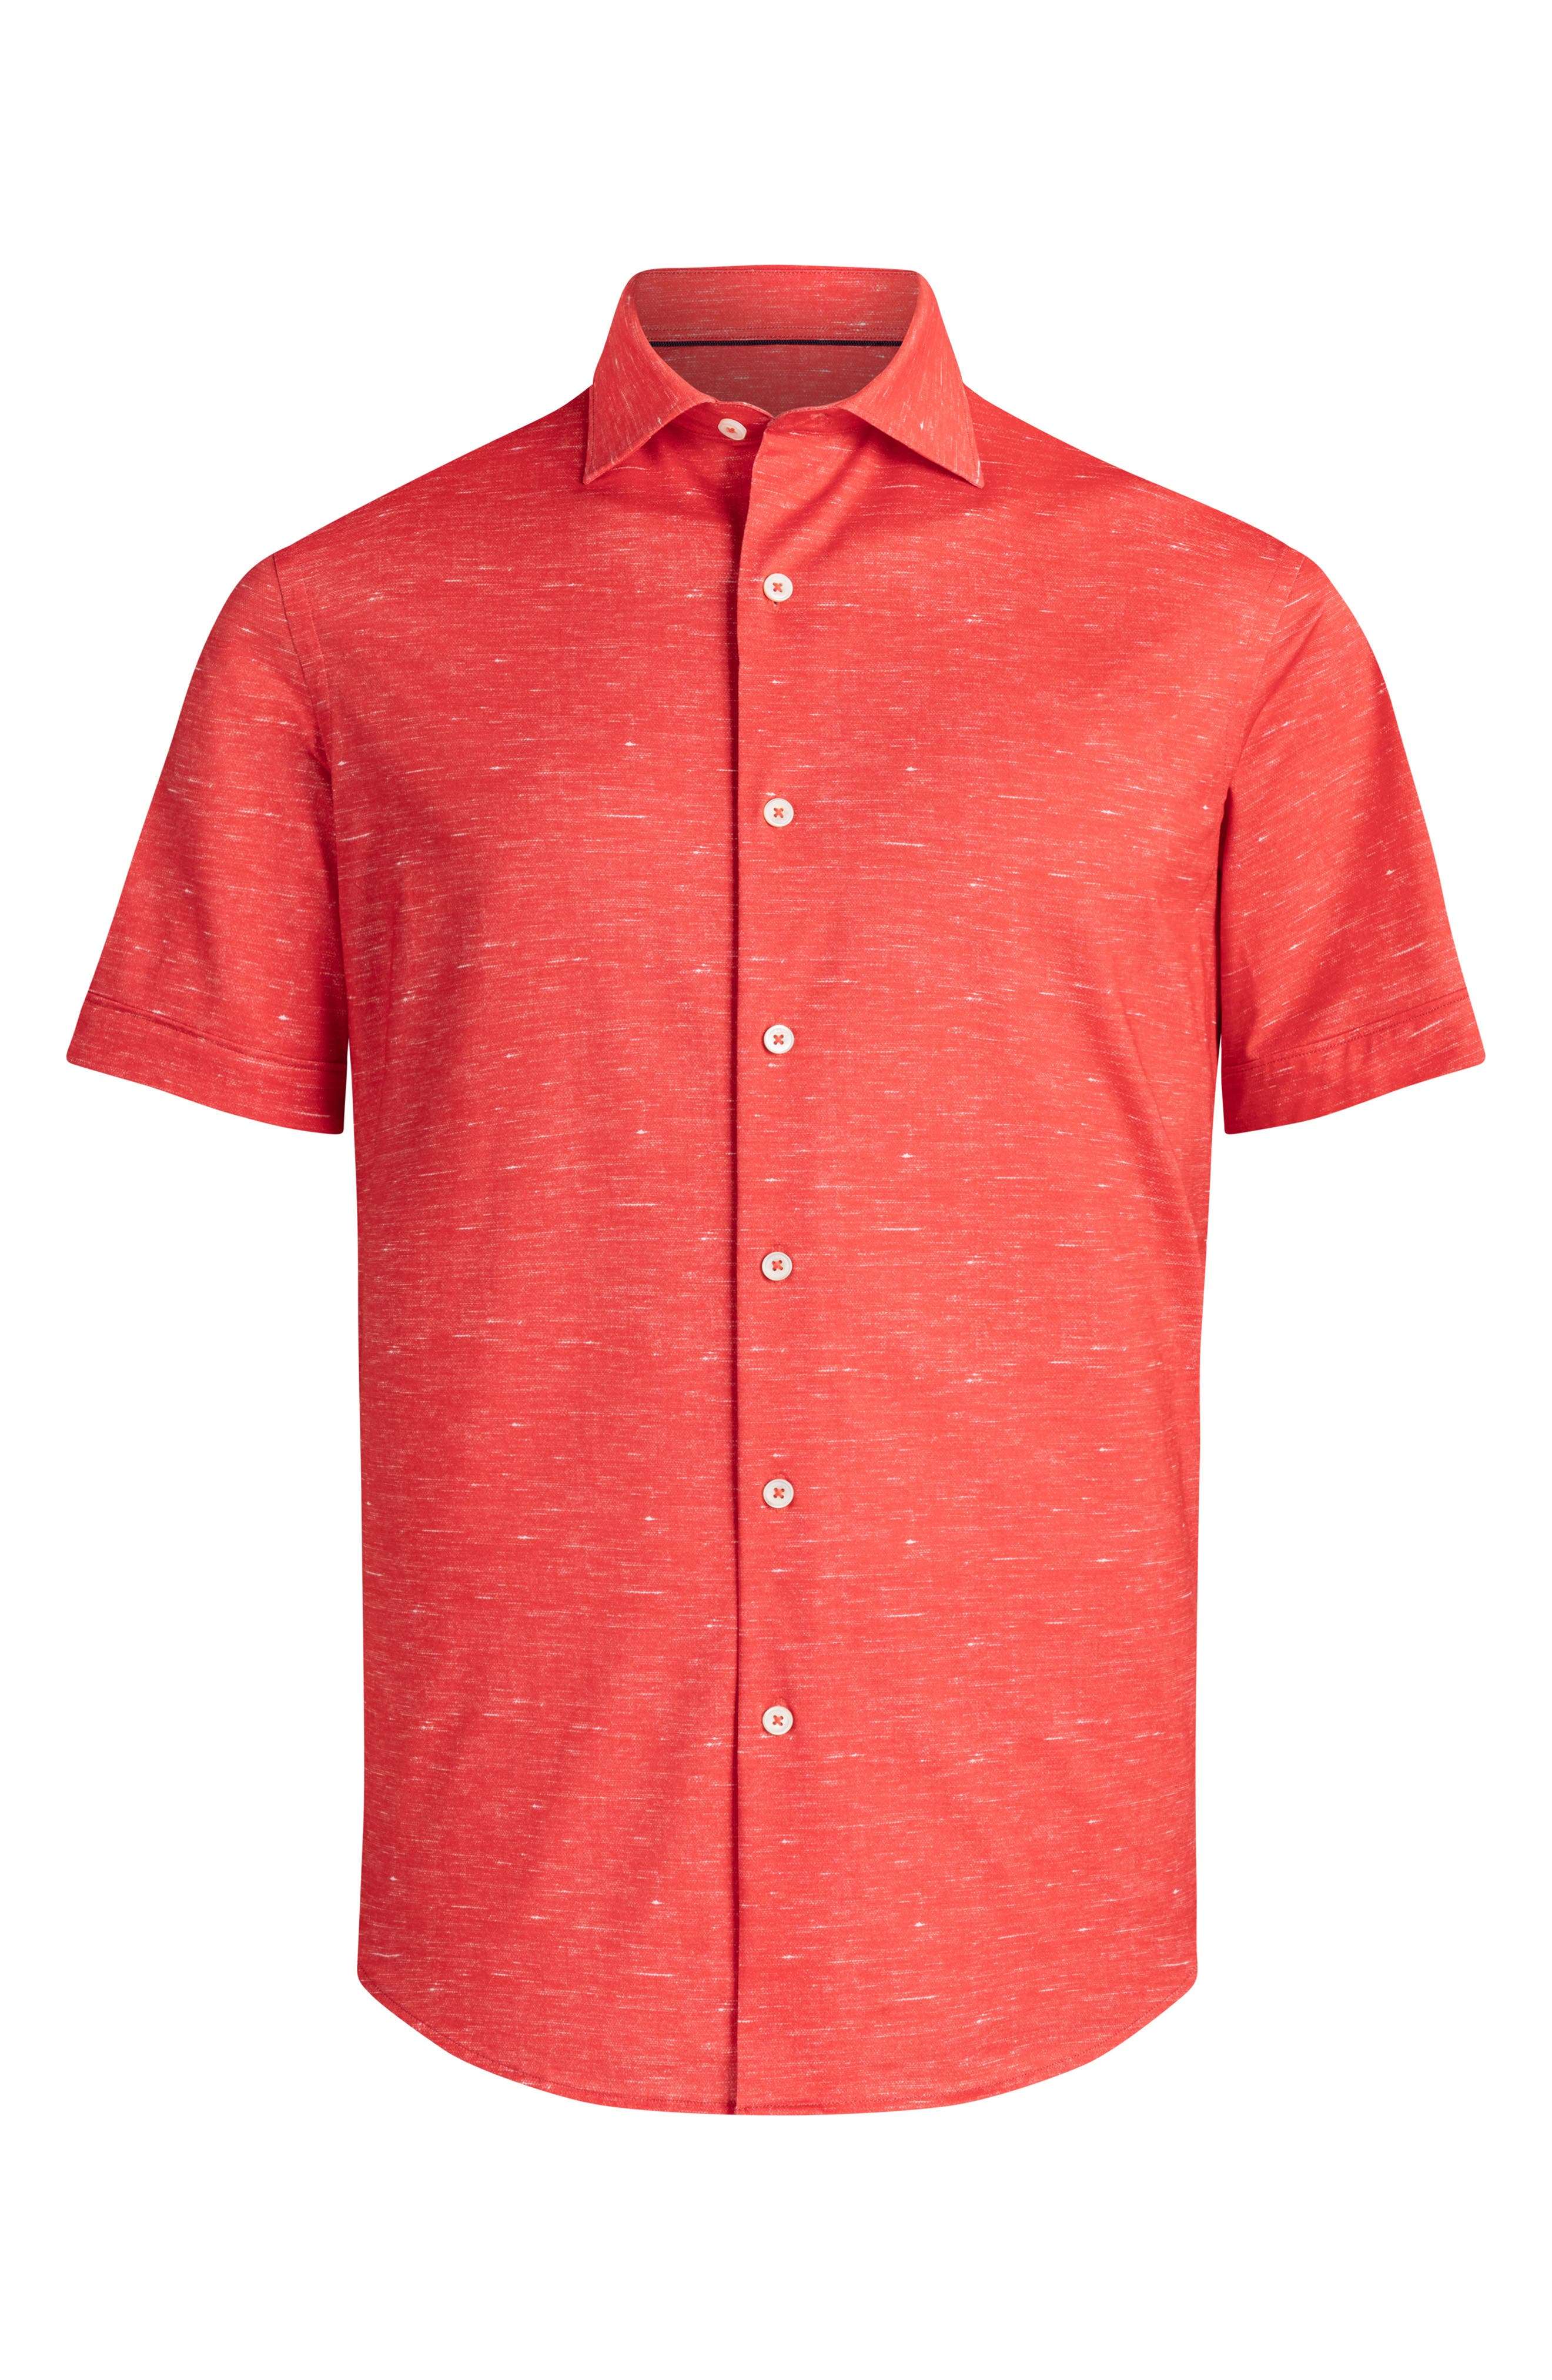 Regular Fit Knit Short Sleeve Shirt